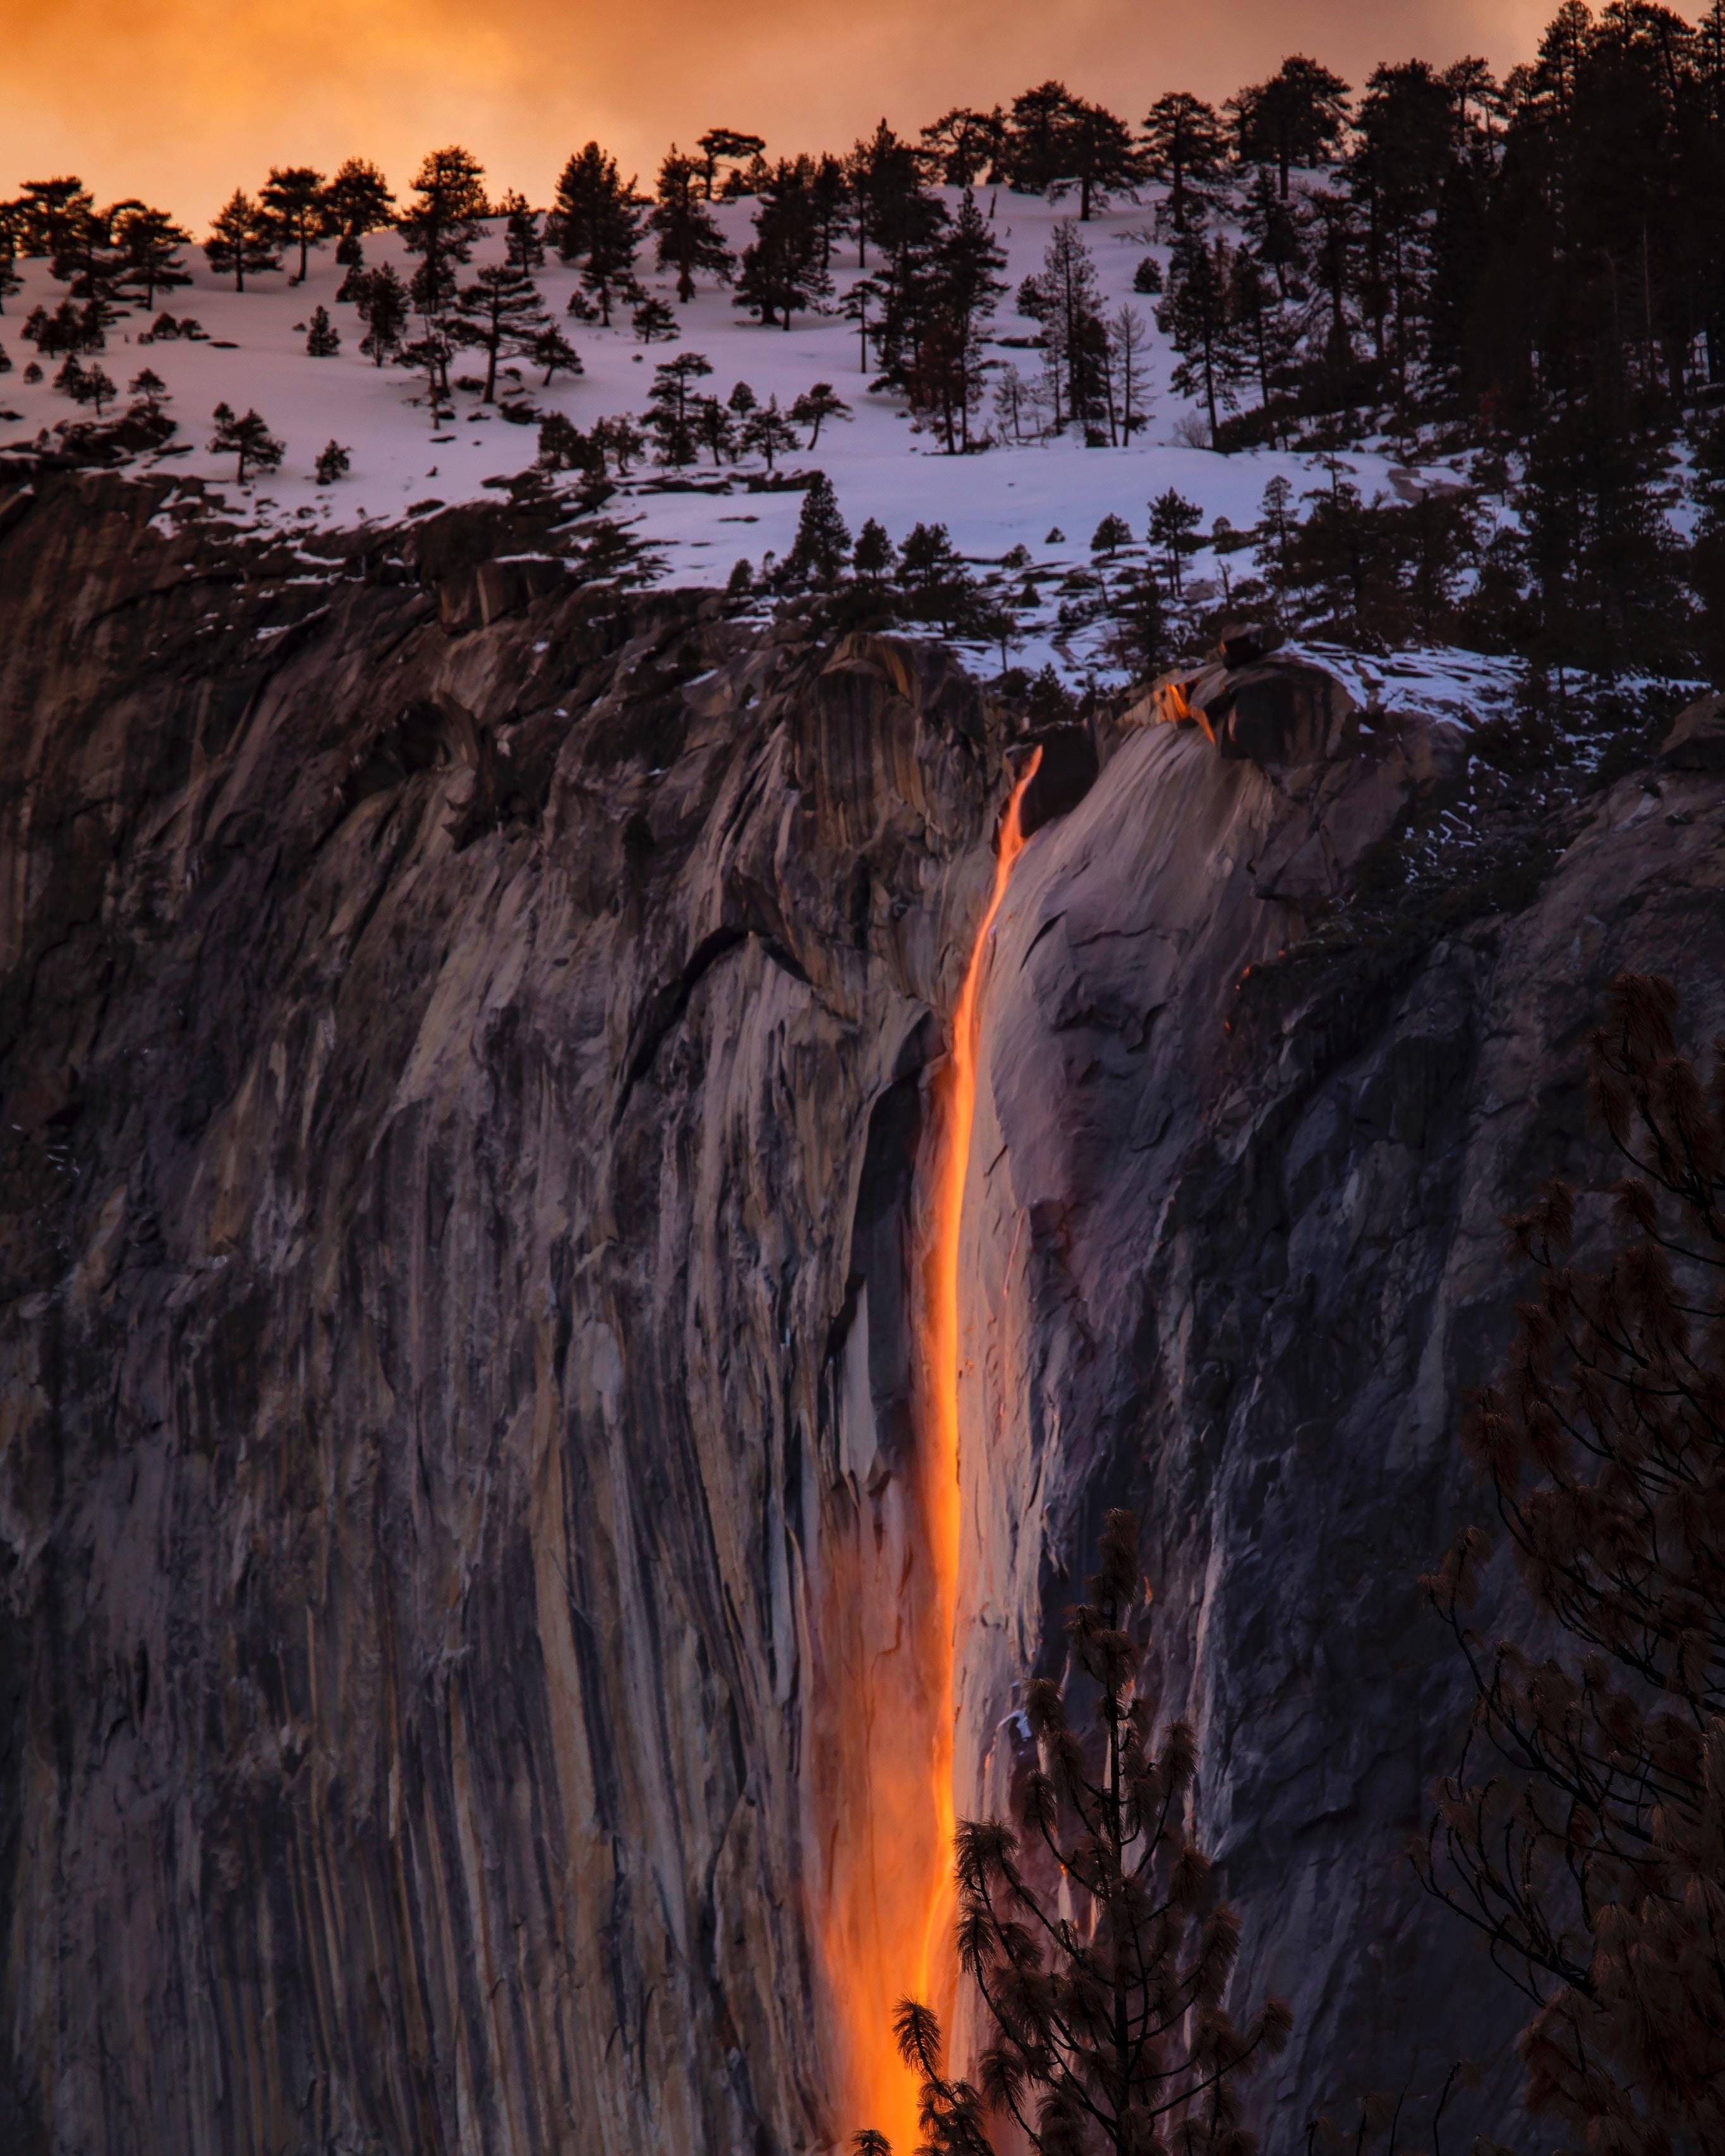 waterfalls near cliff at golden hour